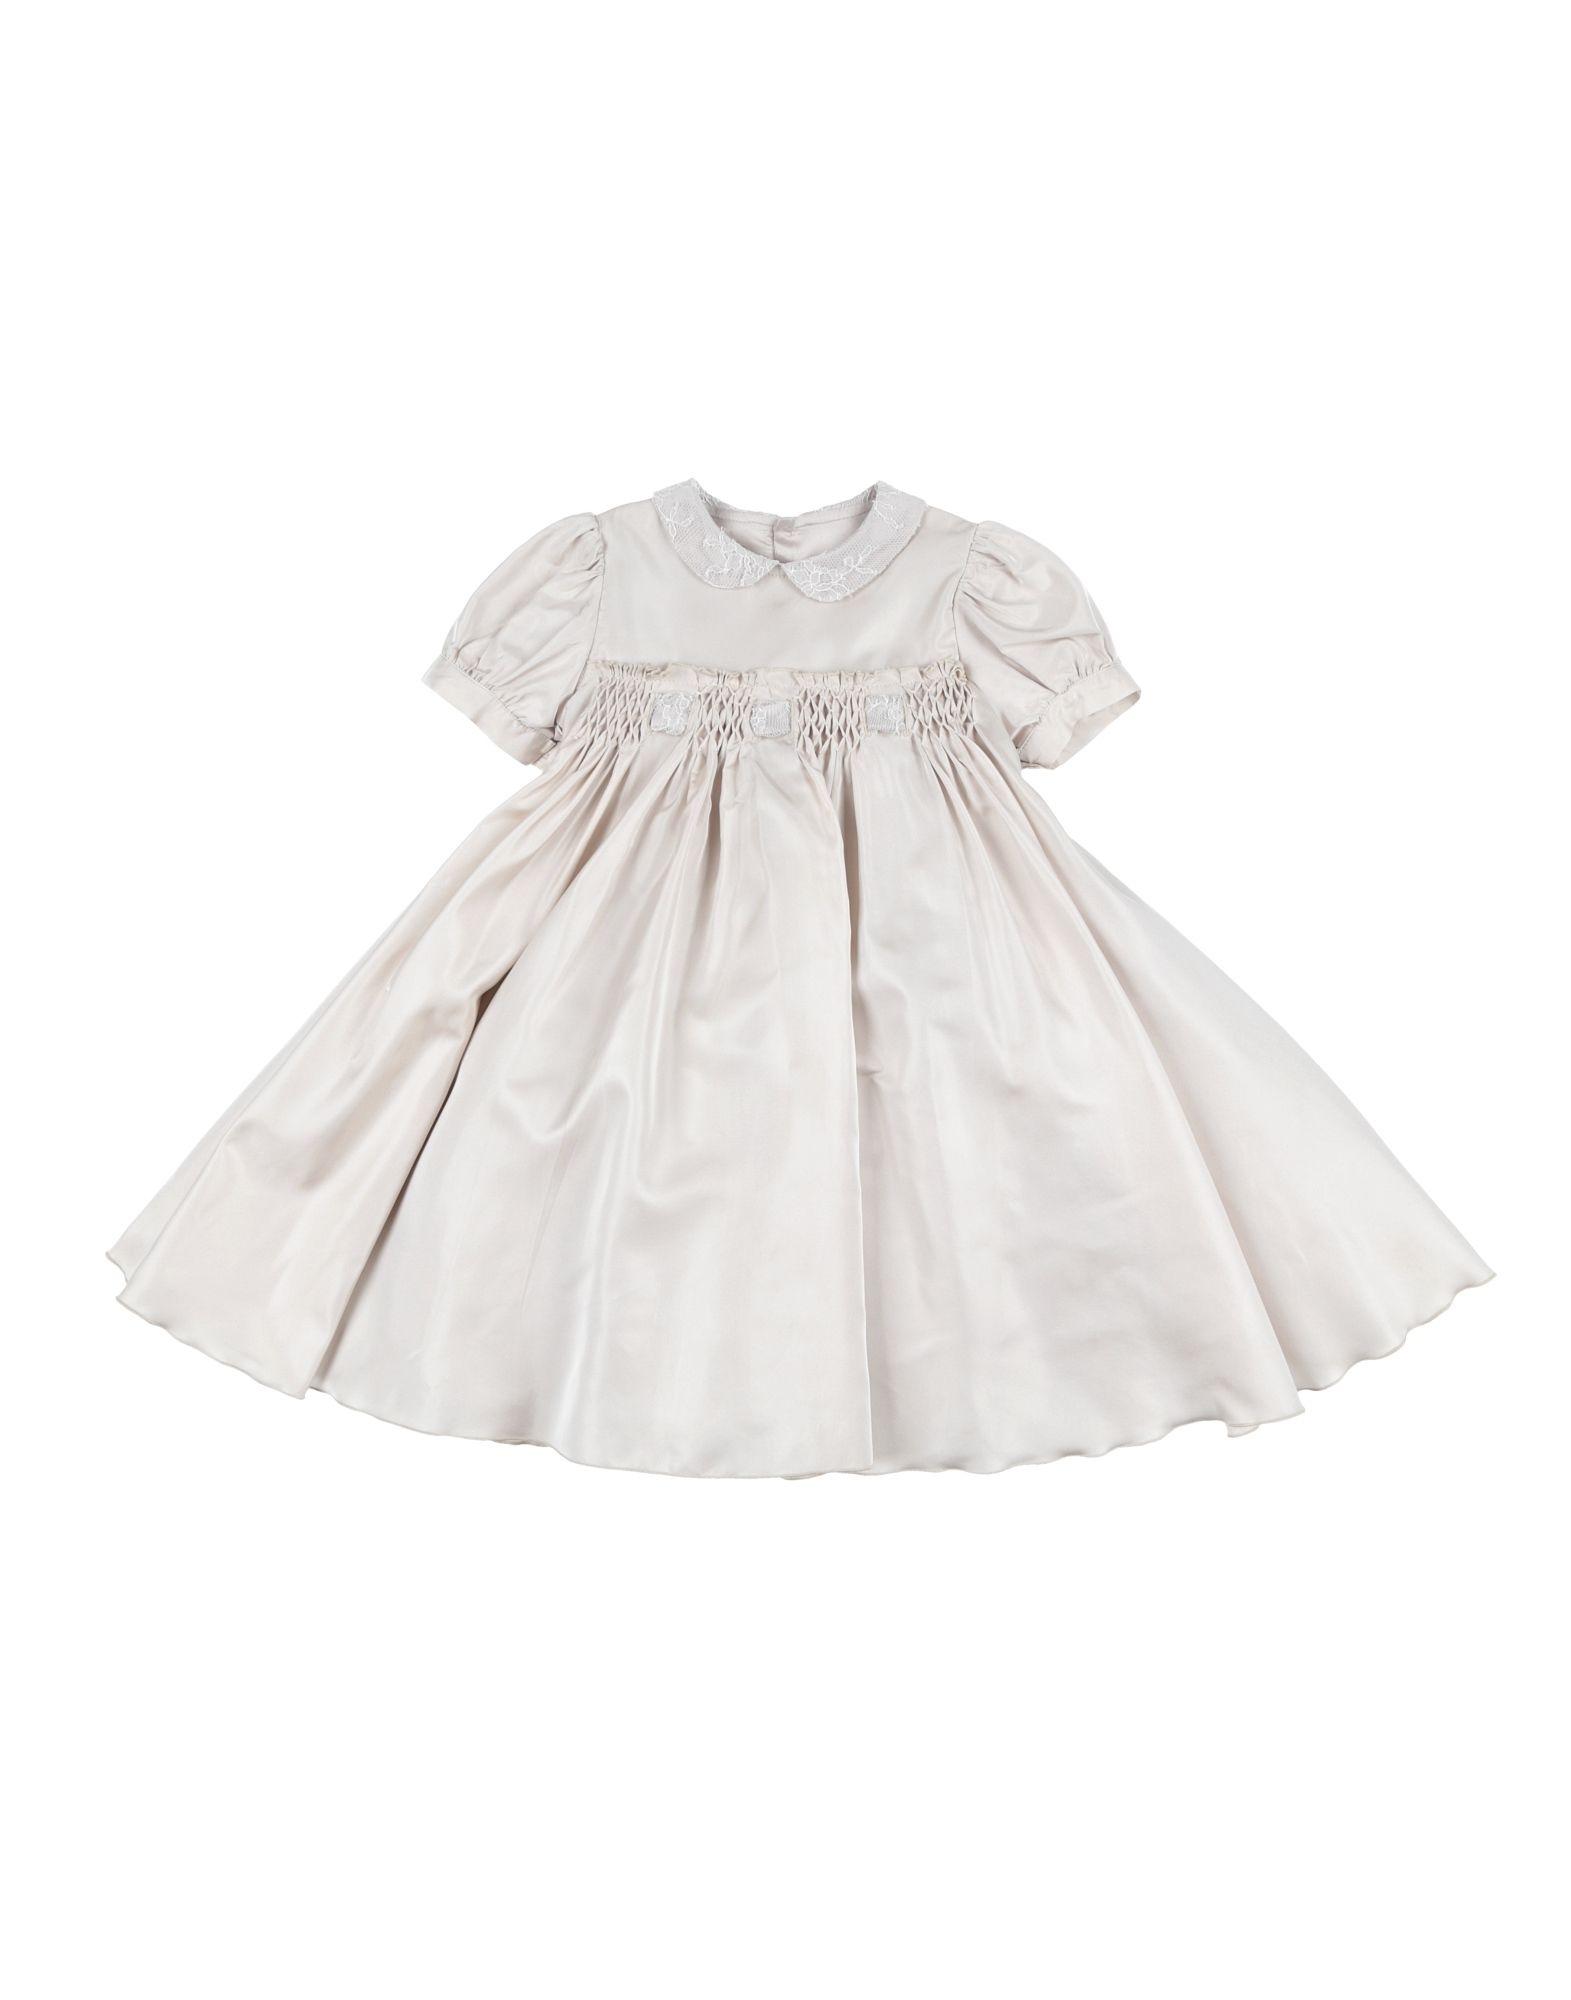 LA STUPENDERIA Dress in Light Grey